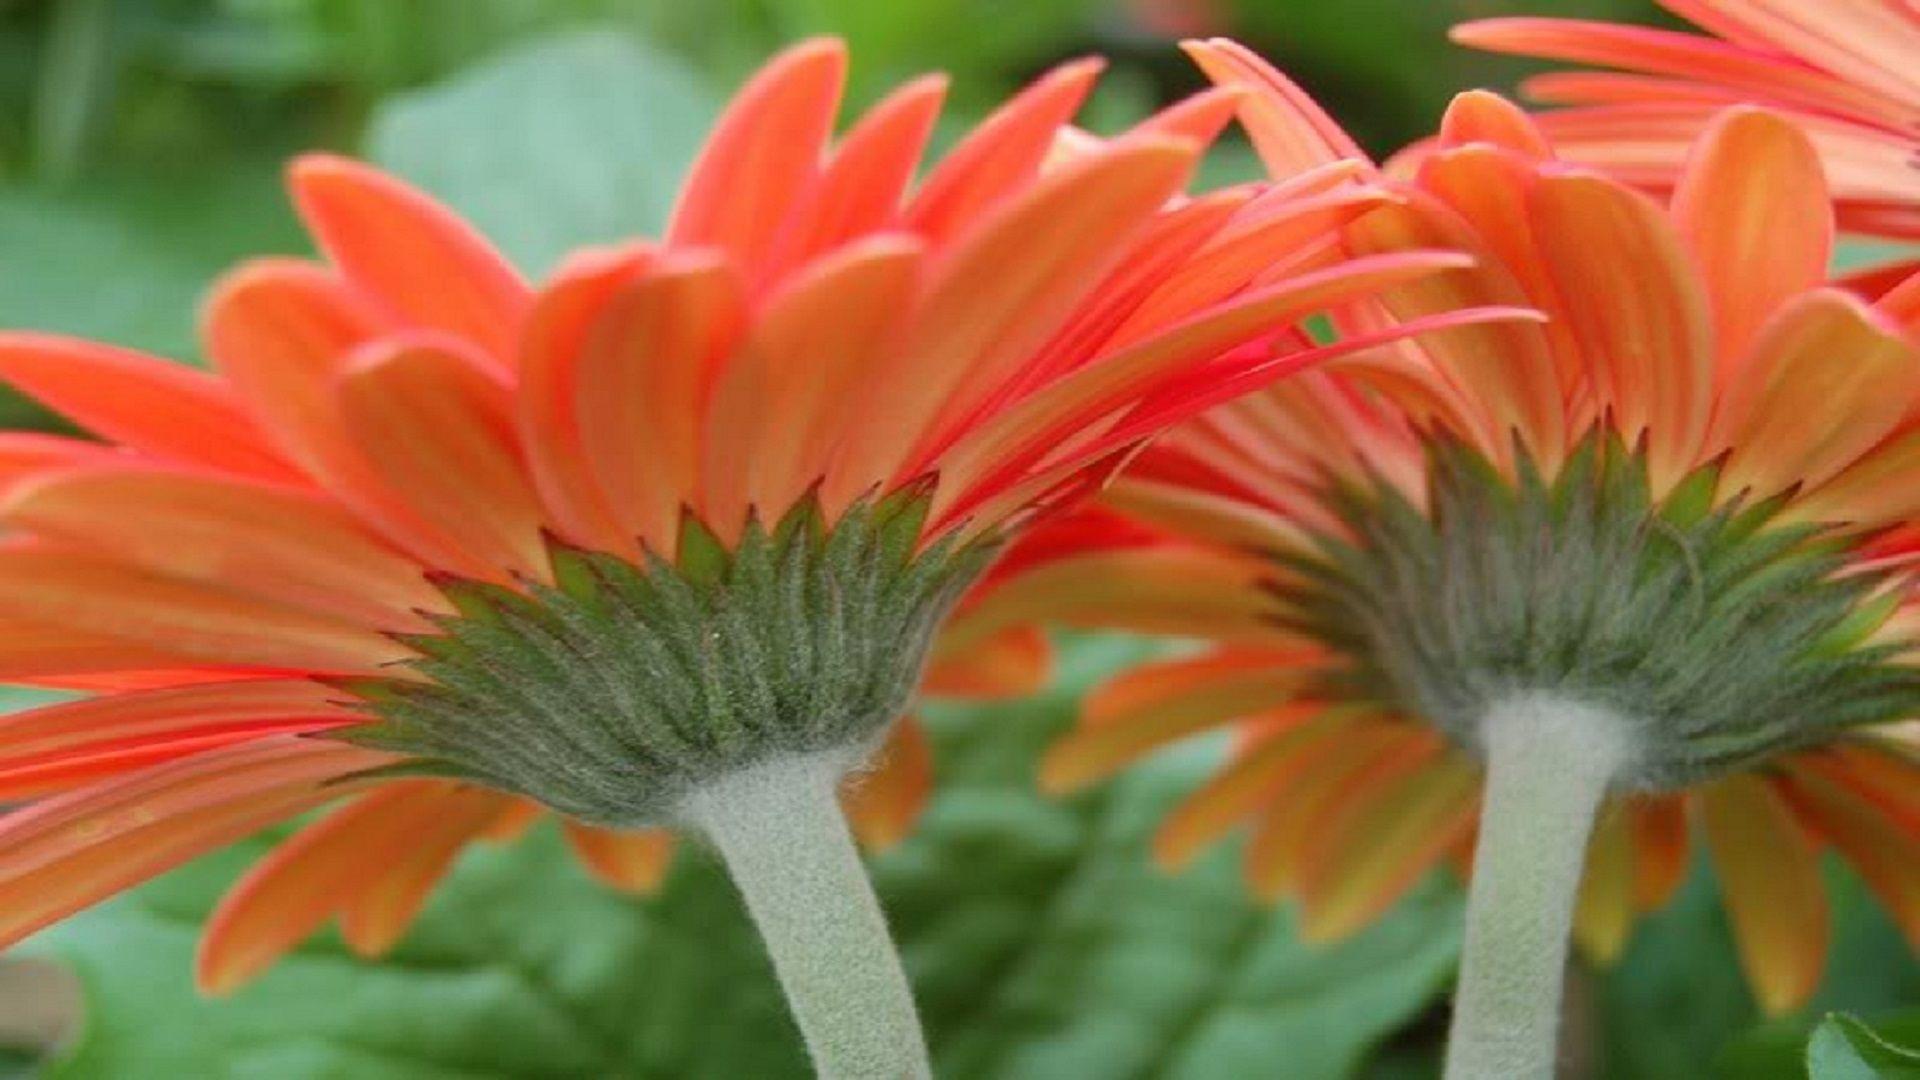 color peach - Google Search | Color-Peach | Pinterest | Colour peach ...